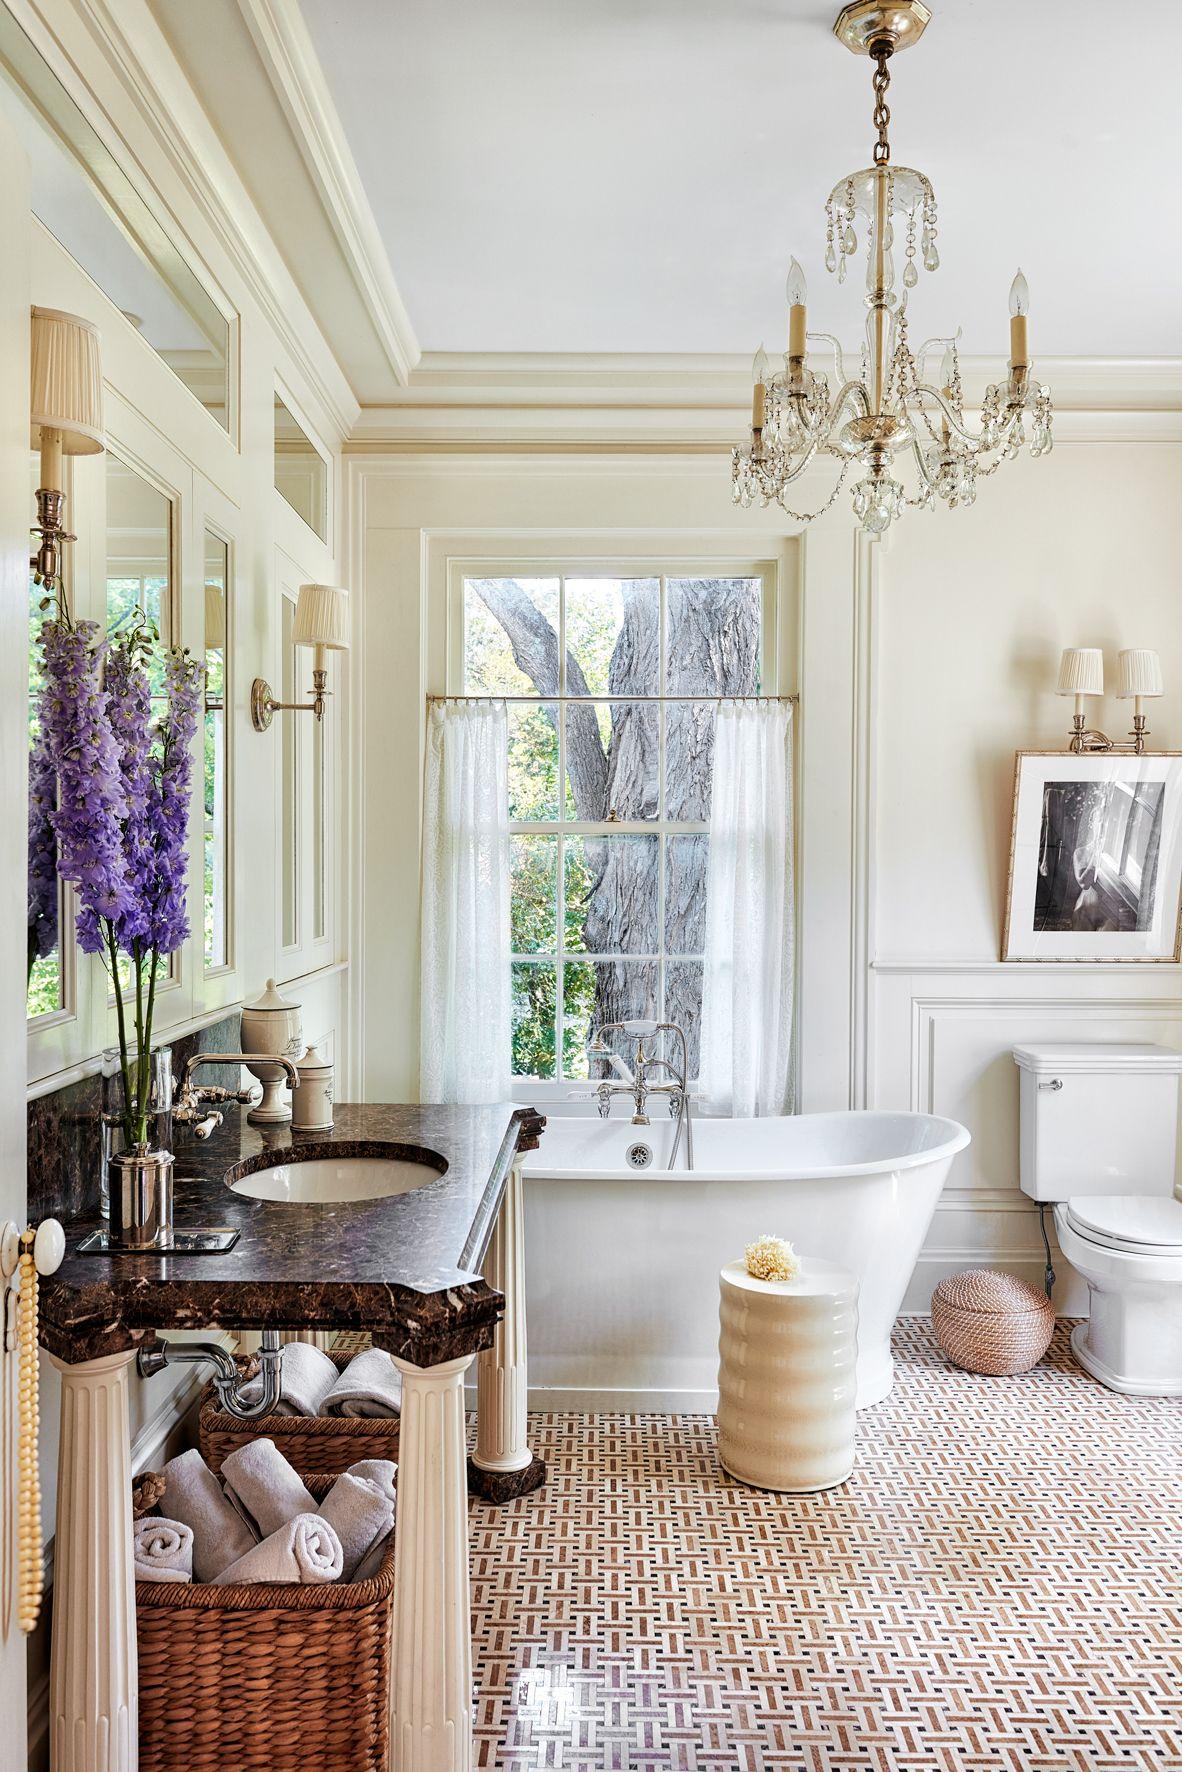 85 Small Bathroom Decor Ideas How To, Decorating A Bathroom